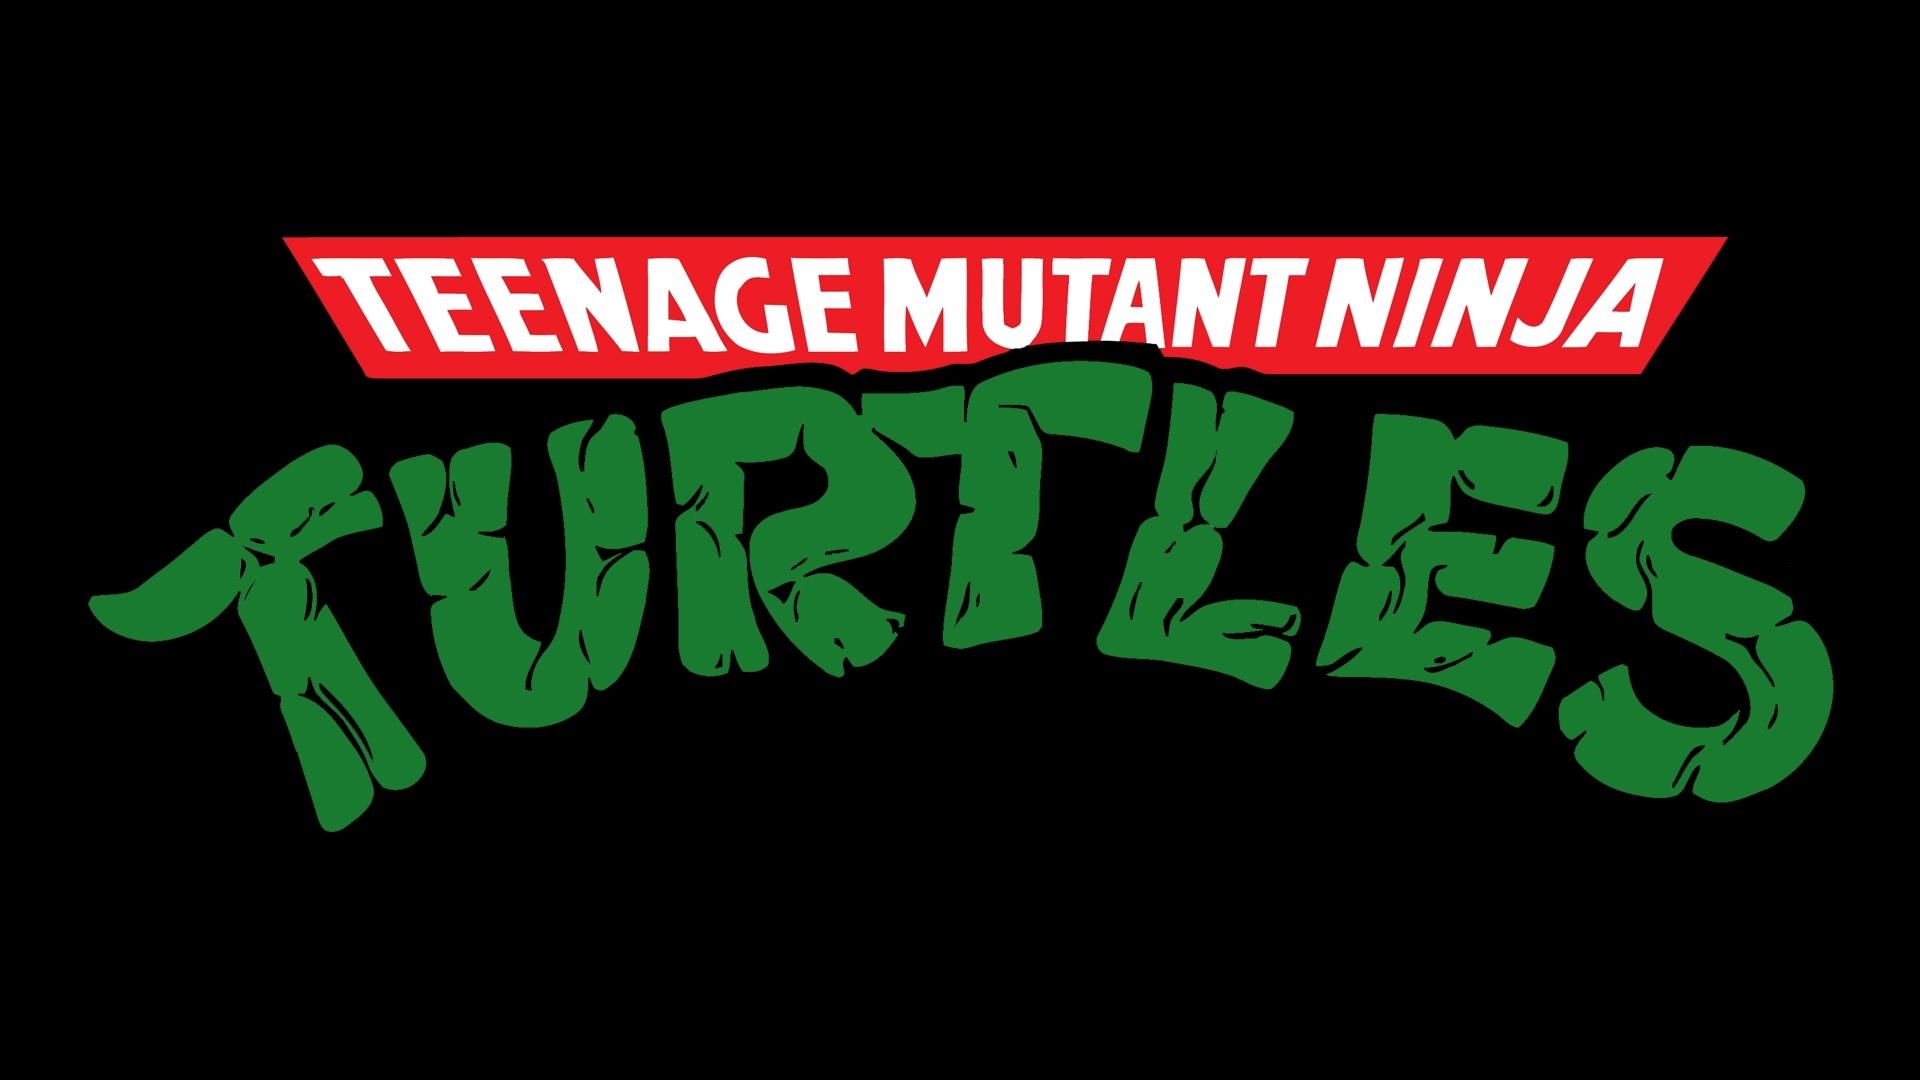 teenage mutant ninja turtles logo wallpaper 40699 1920x1080 px